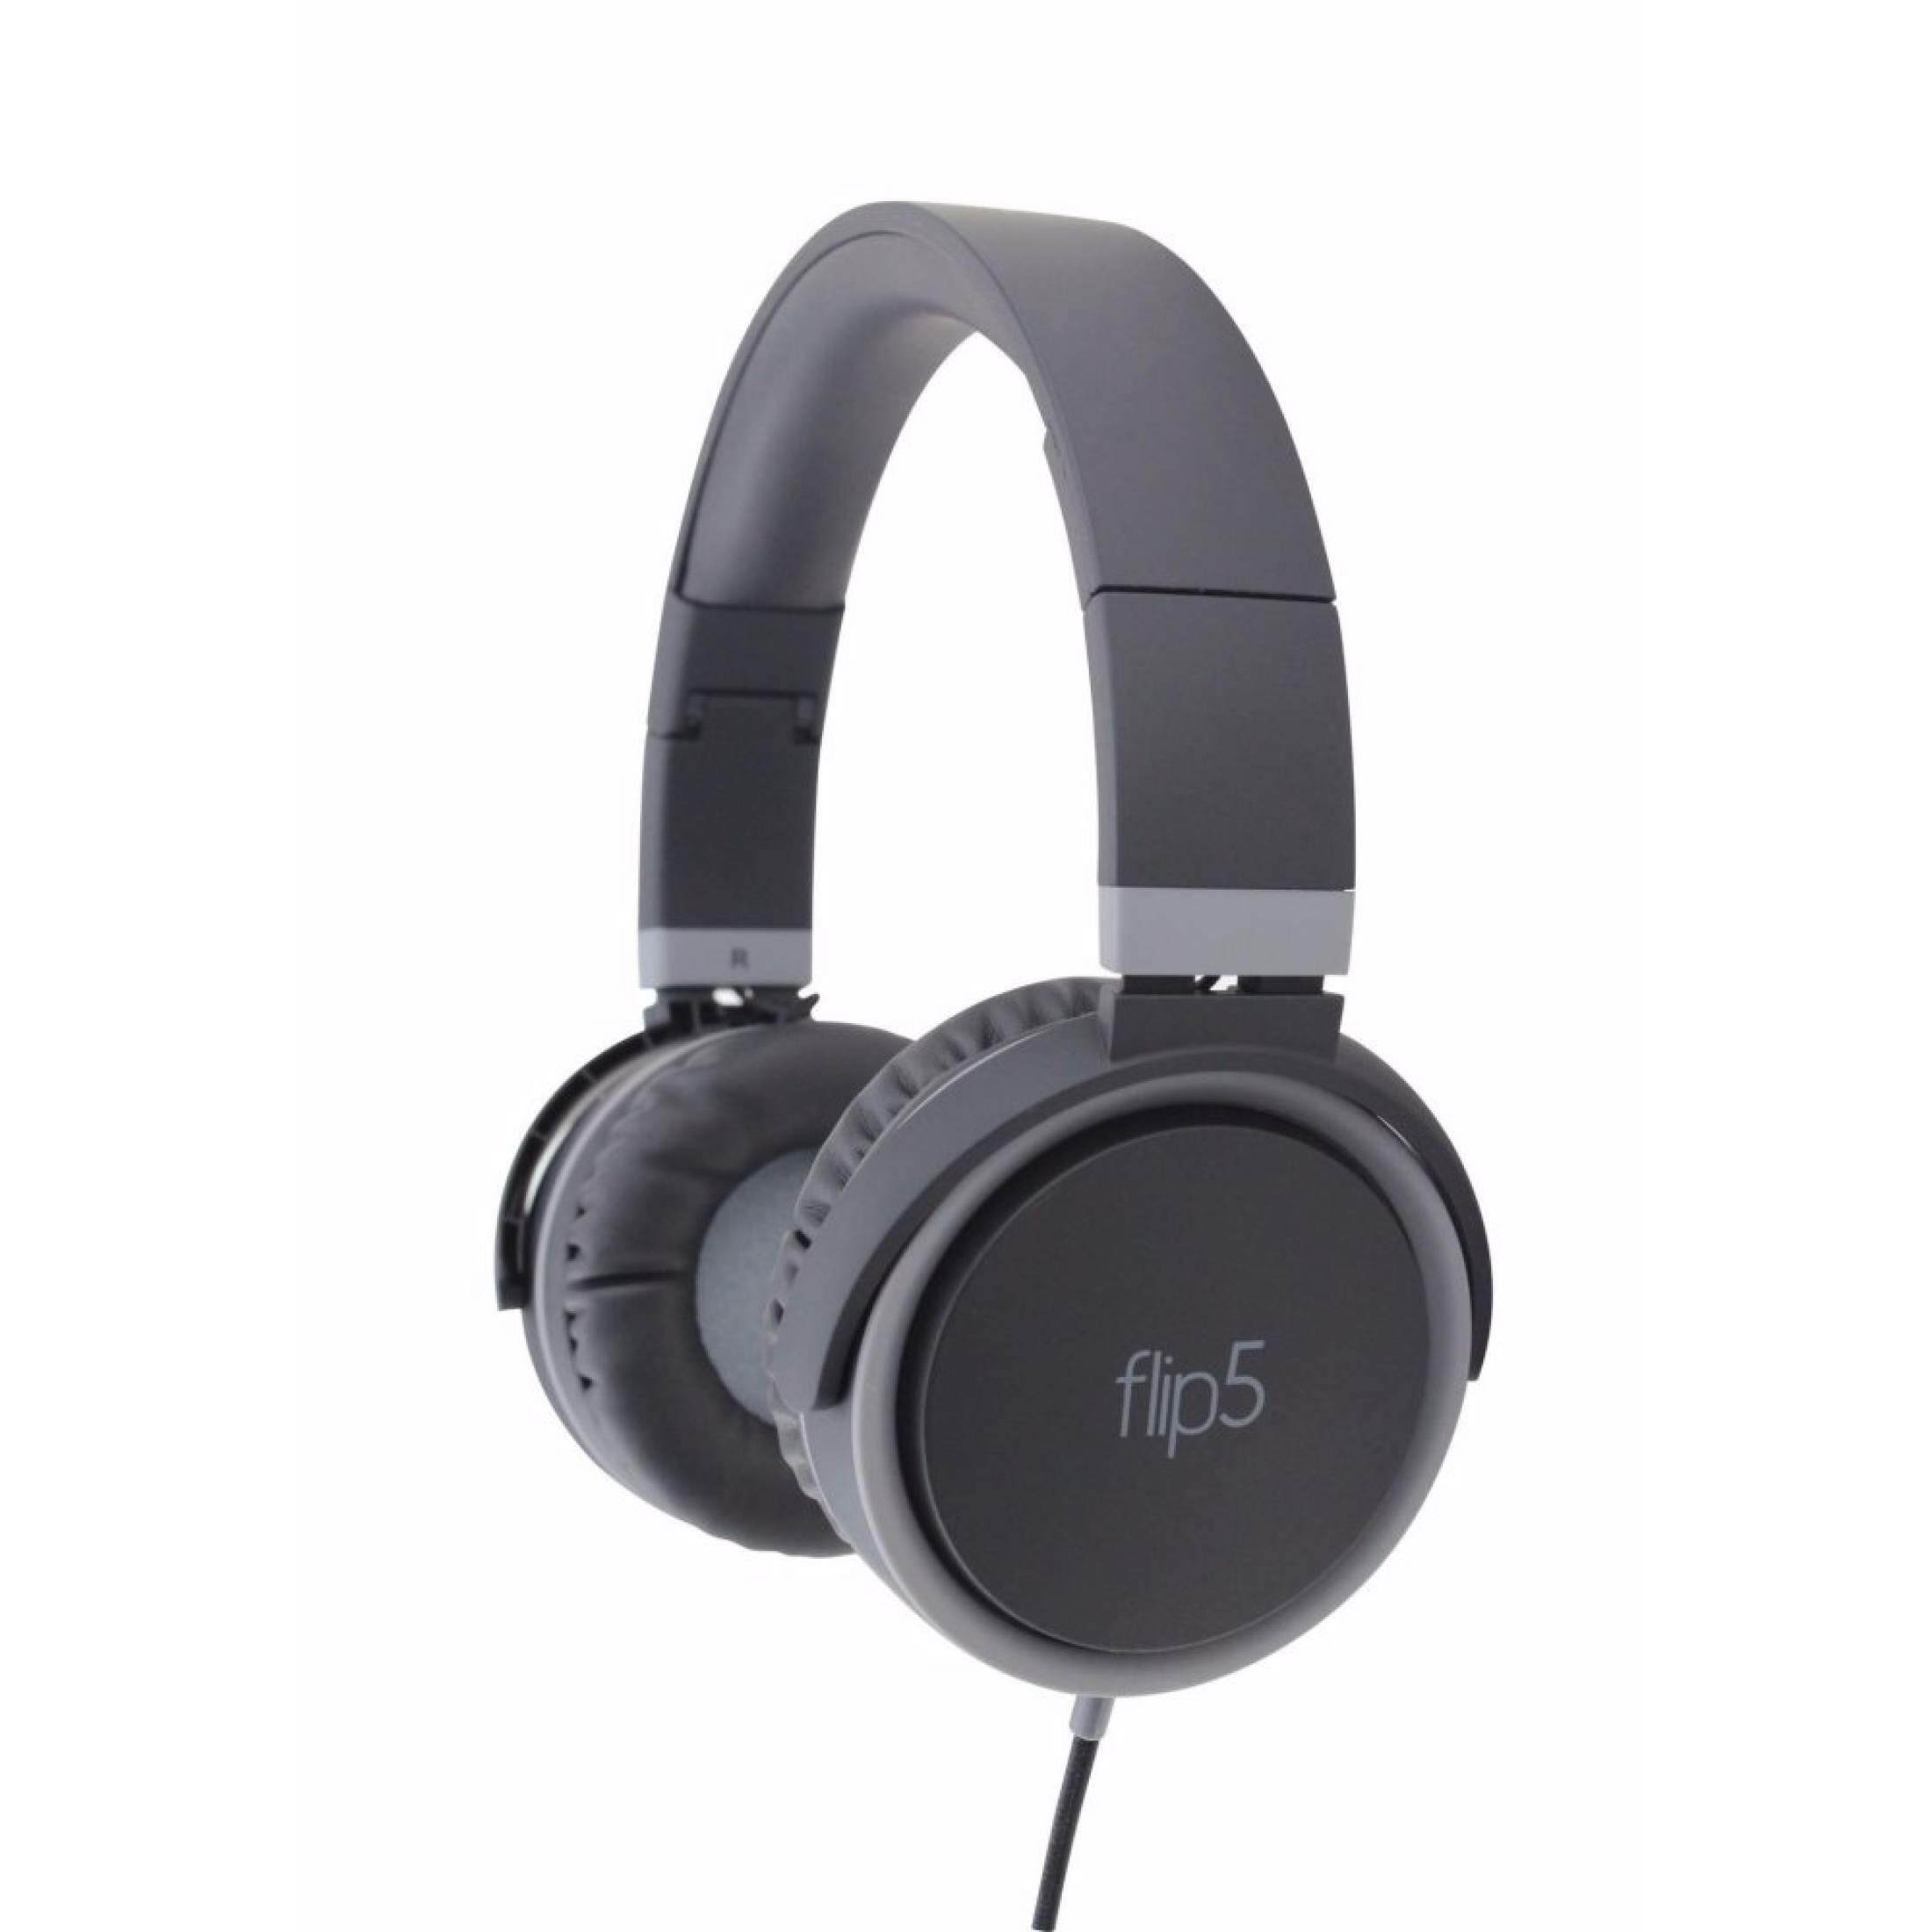 Vinnfier Wired Flip 5 Headphone (Black Grey/Black Red)